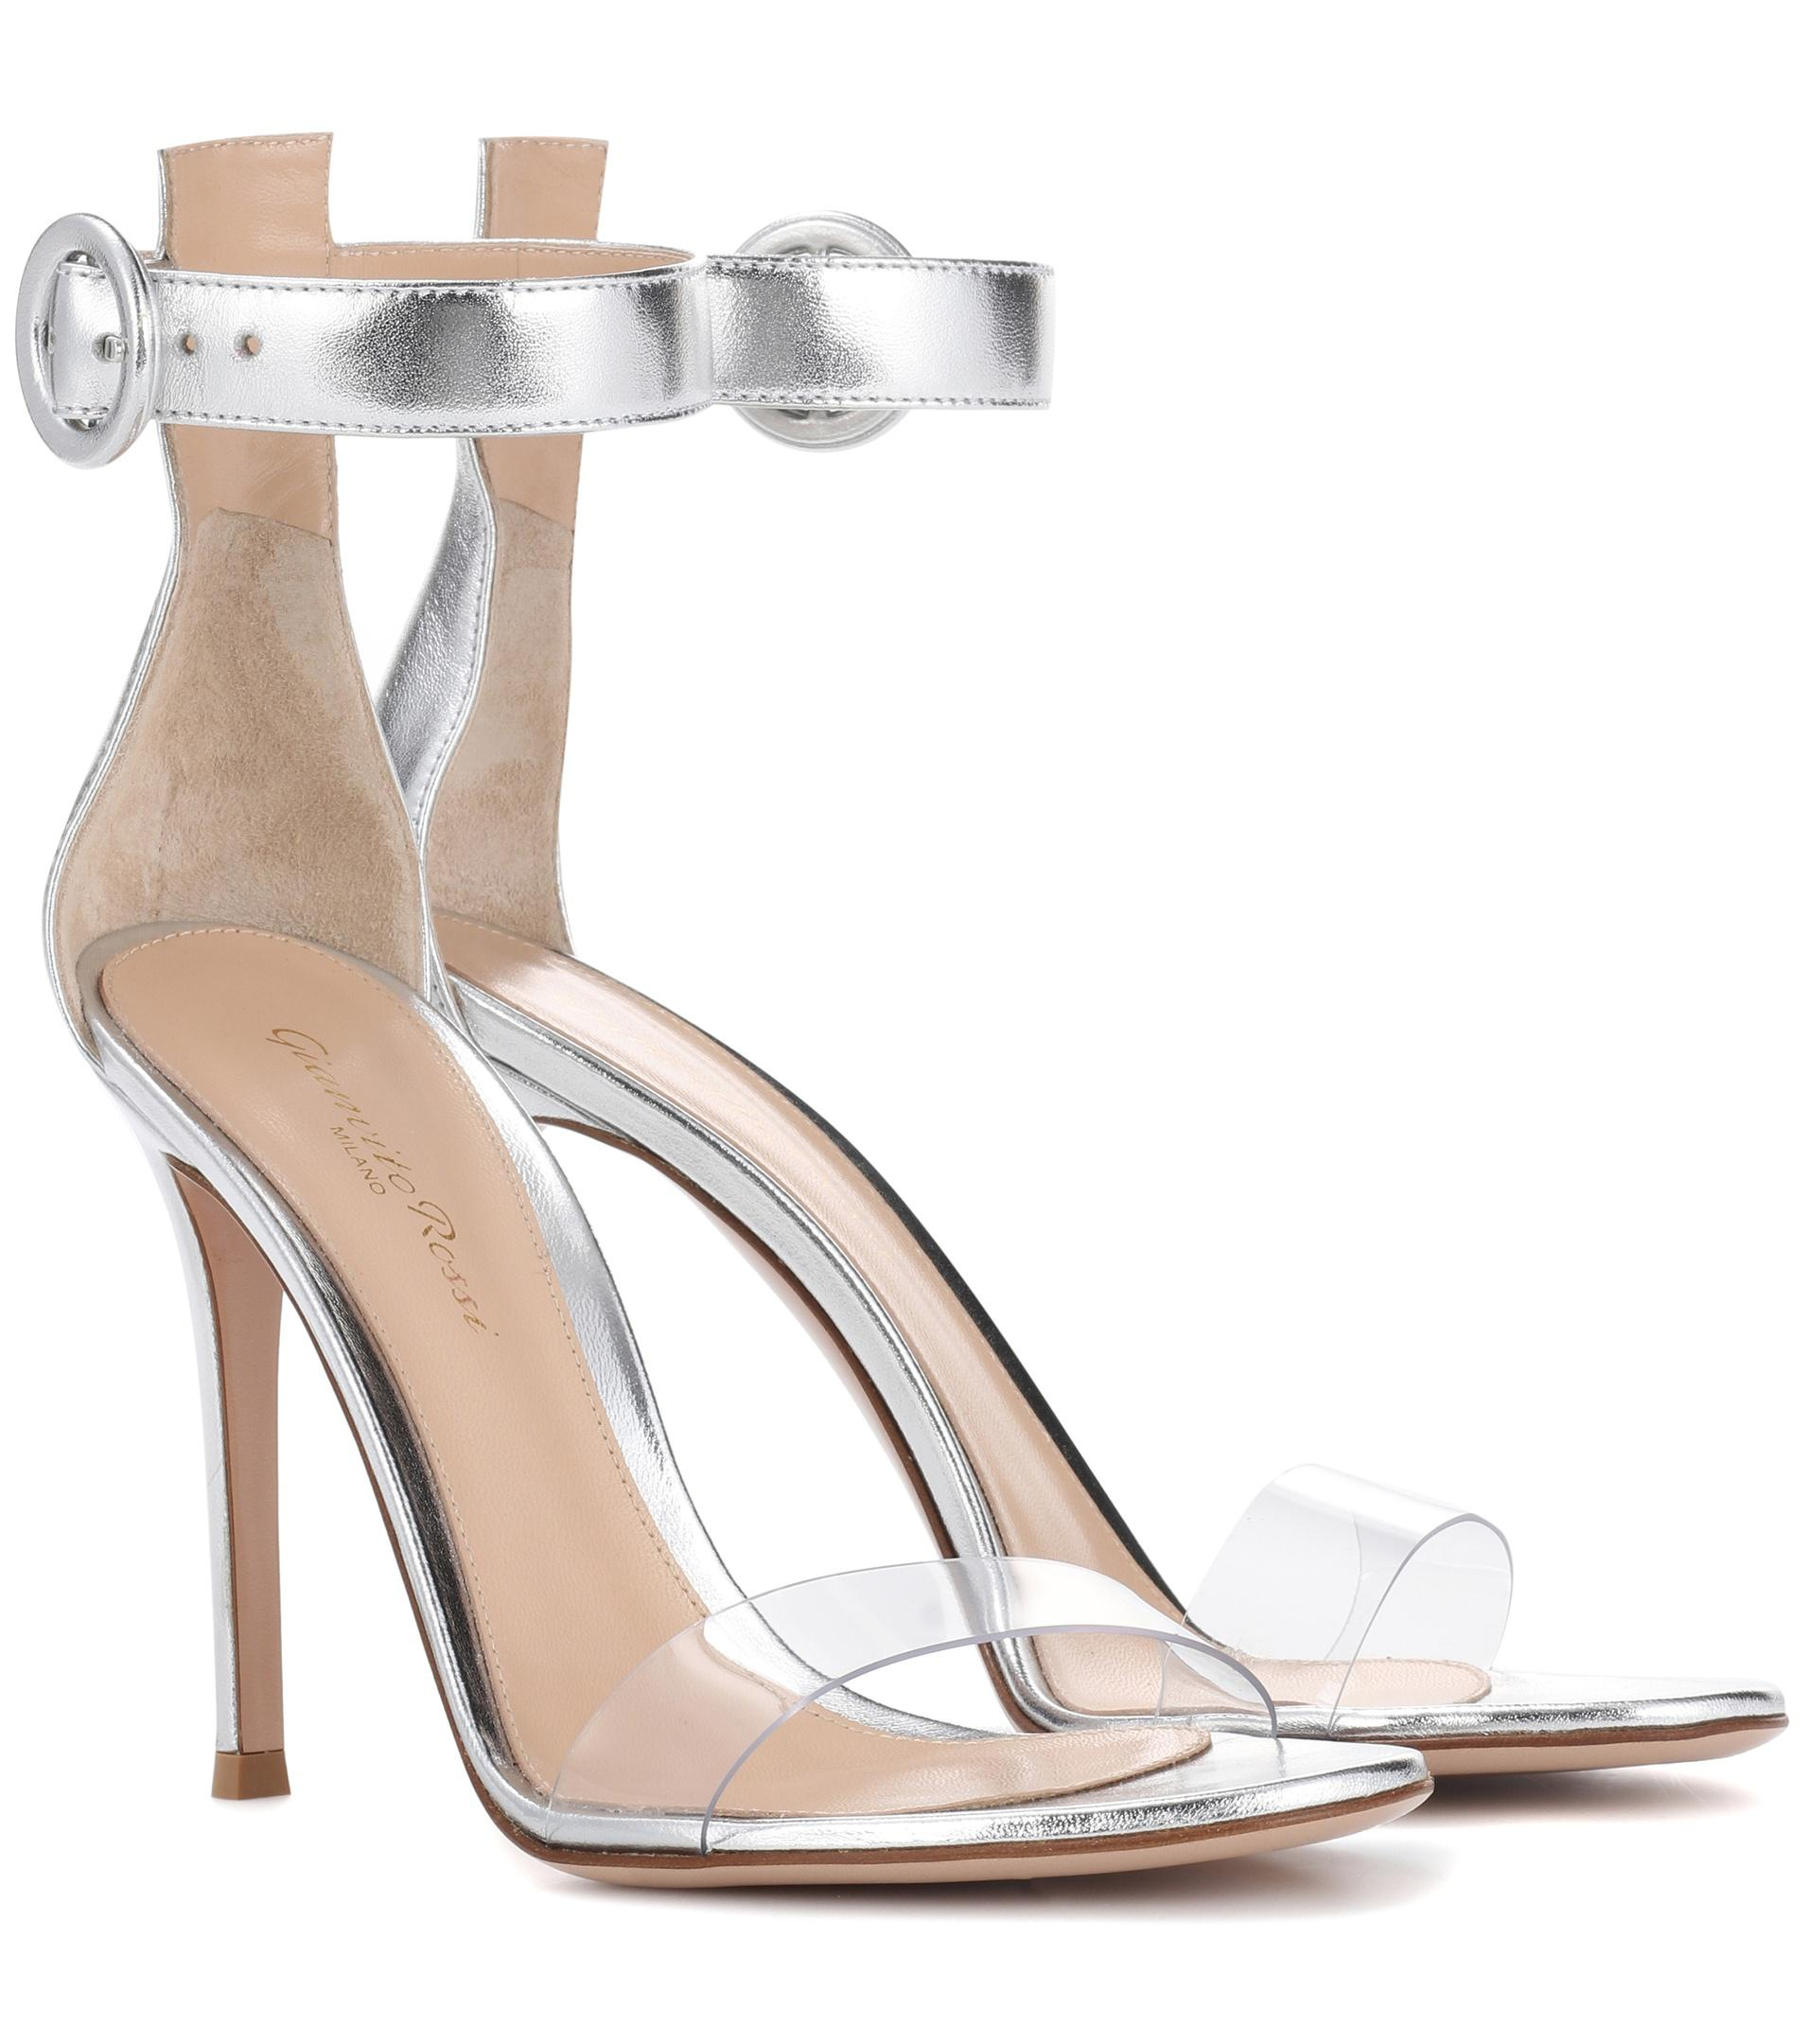 54f5c6f625d Gianvito Rossi Metallic Leather Sandals in Metallic - Lyst